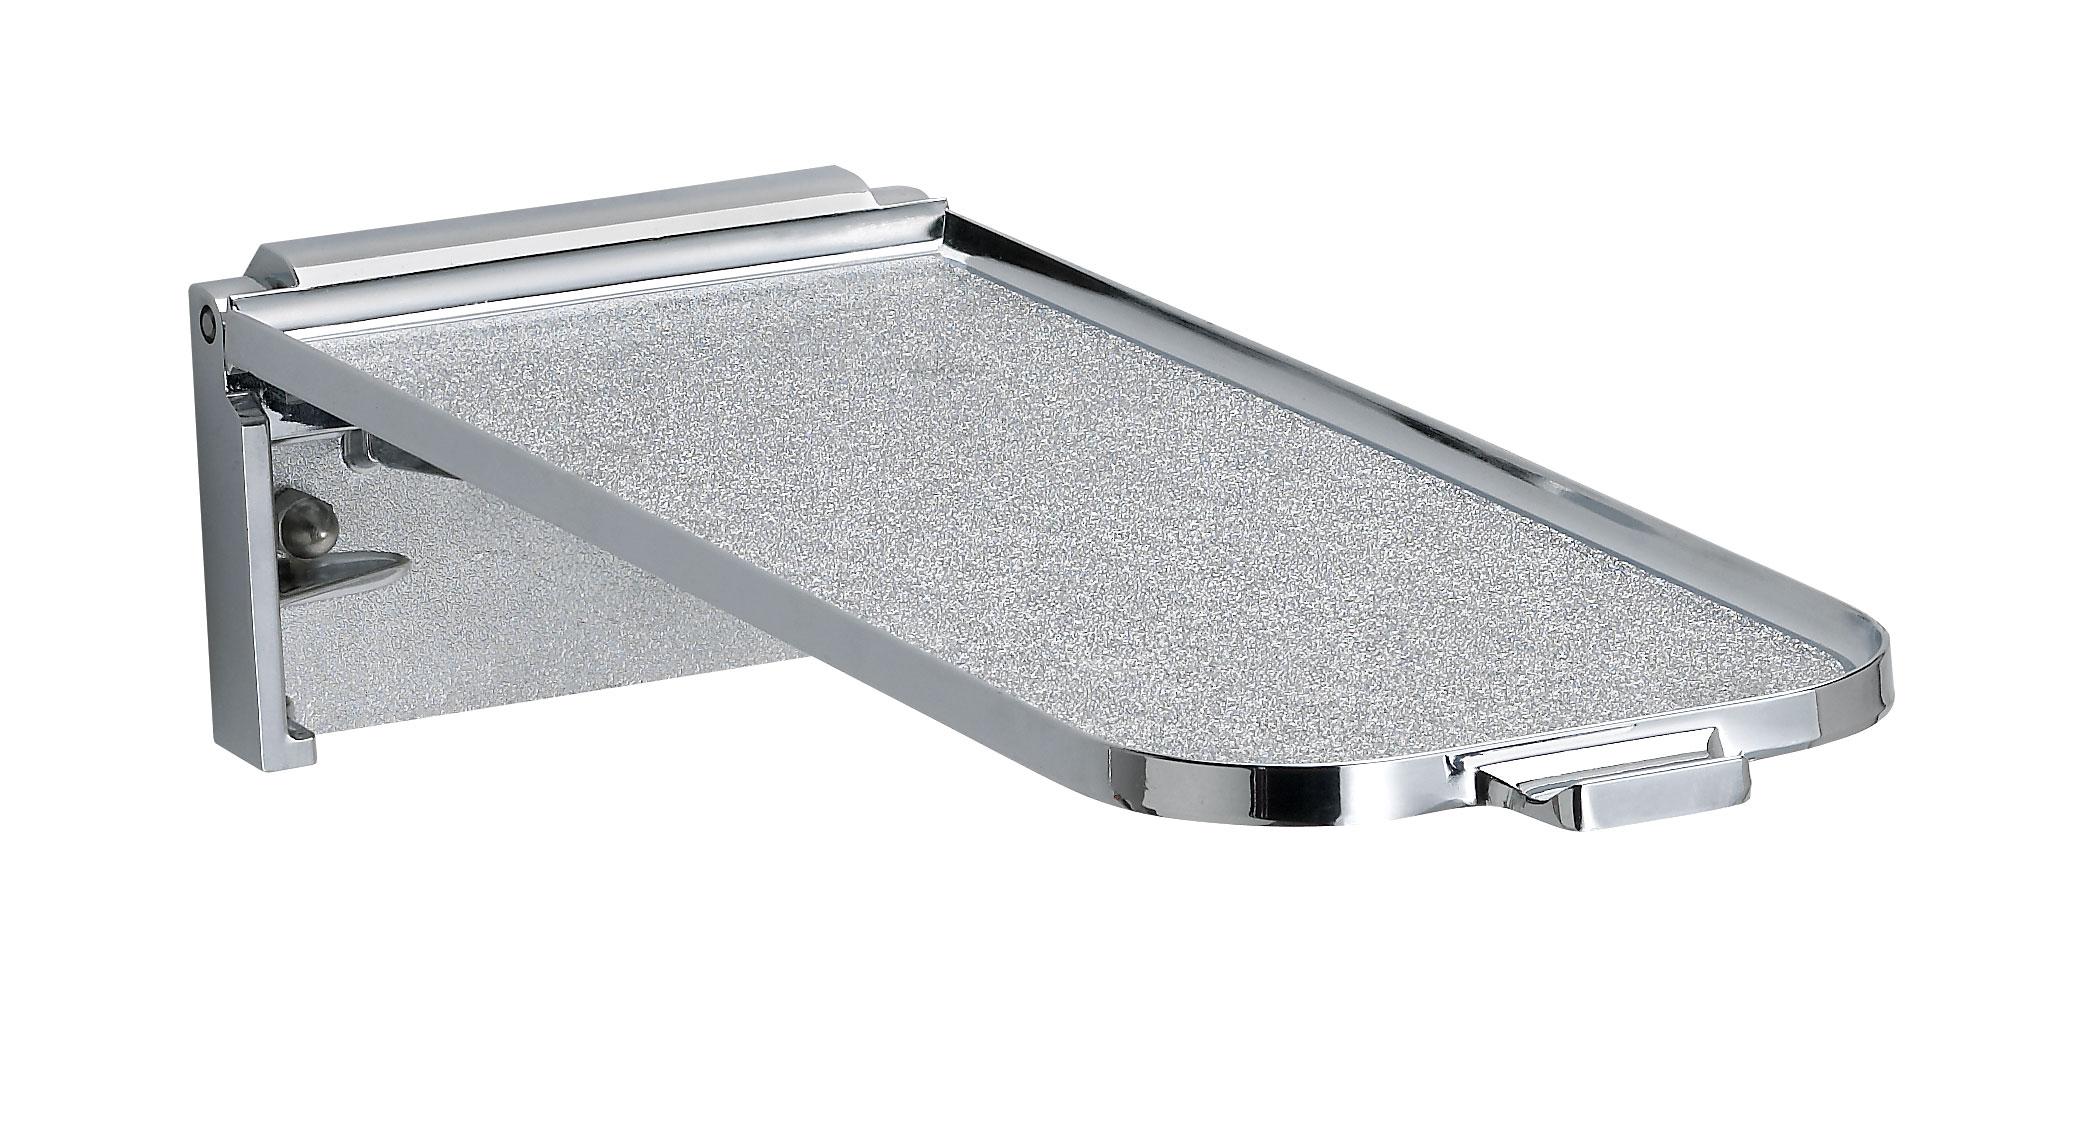 Bradley Utility Shelf Model 790 Washroom Equipment